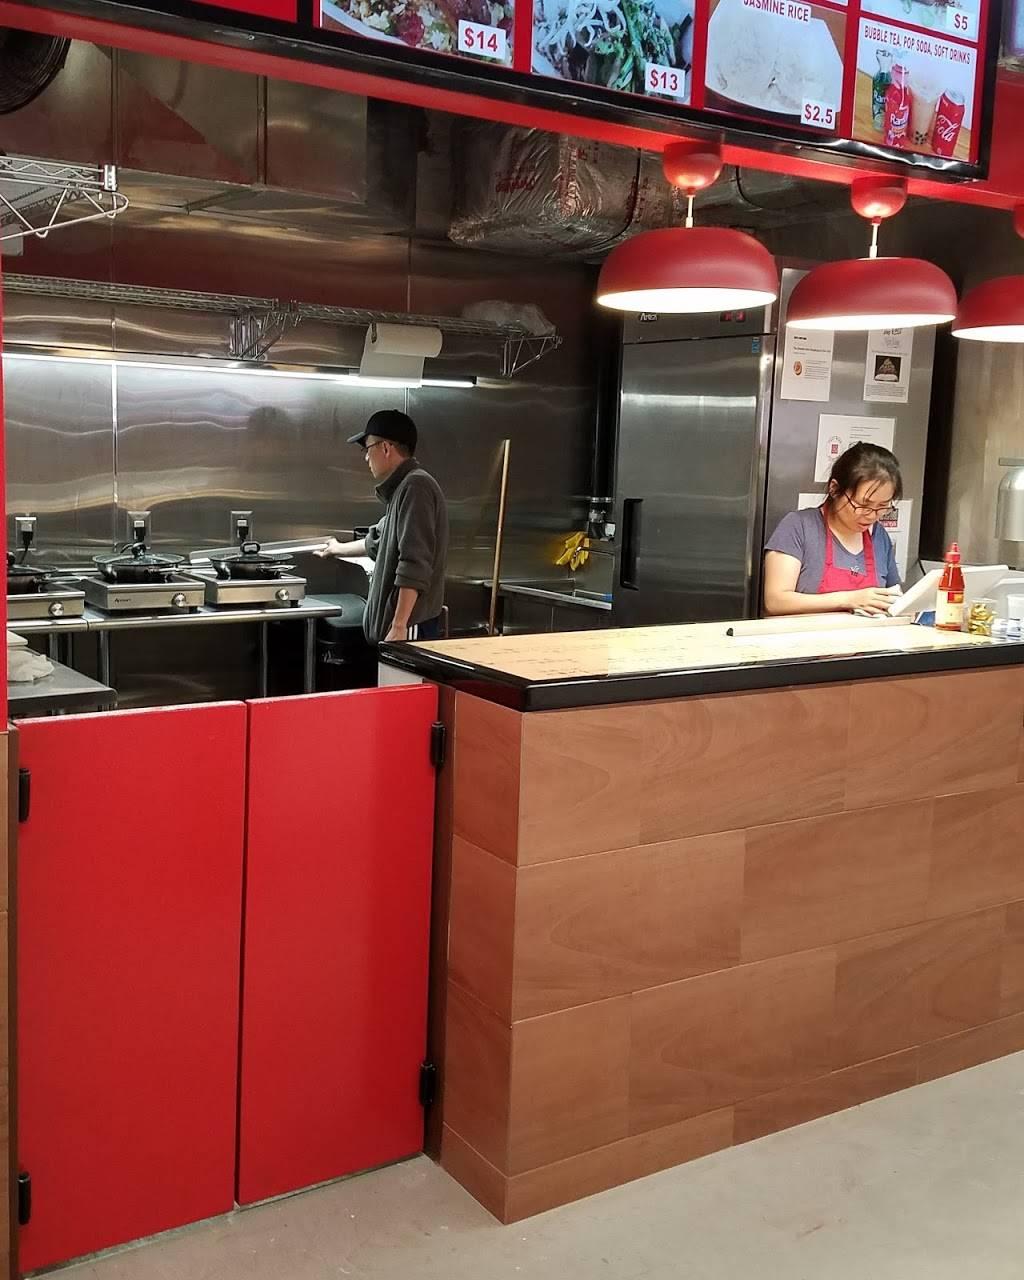 East Wind Snack Shop   restaurant   103 N 3rd St, Brooklyn, NY 11249, USA   9178252082 OR +1 917-825-2082